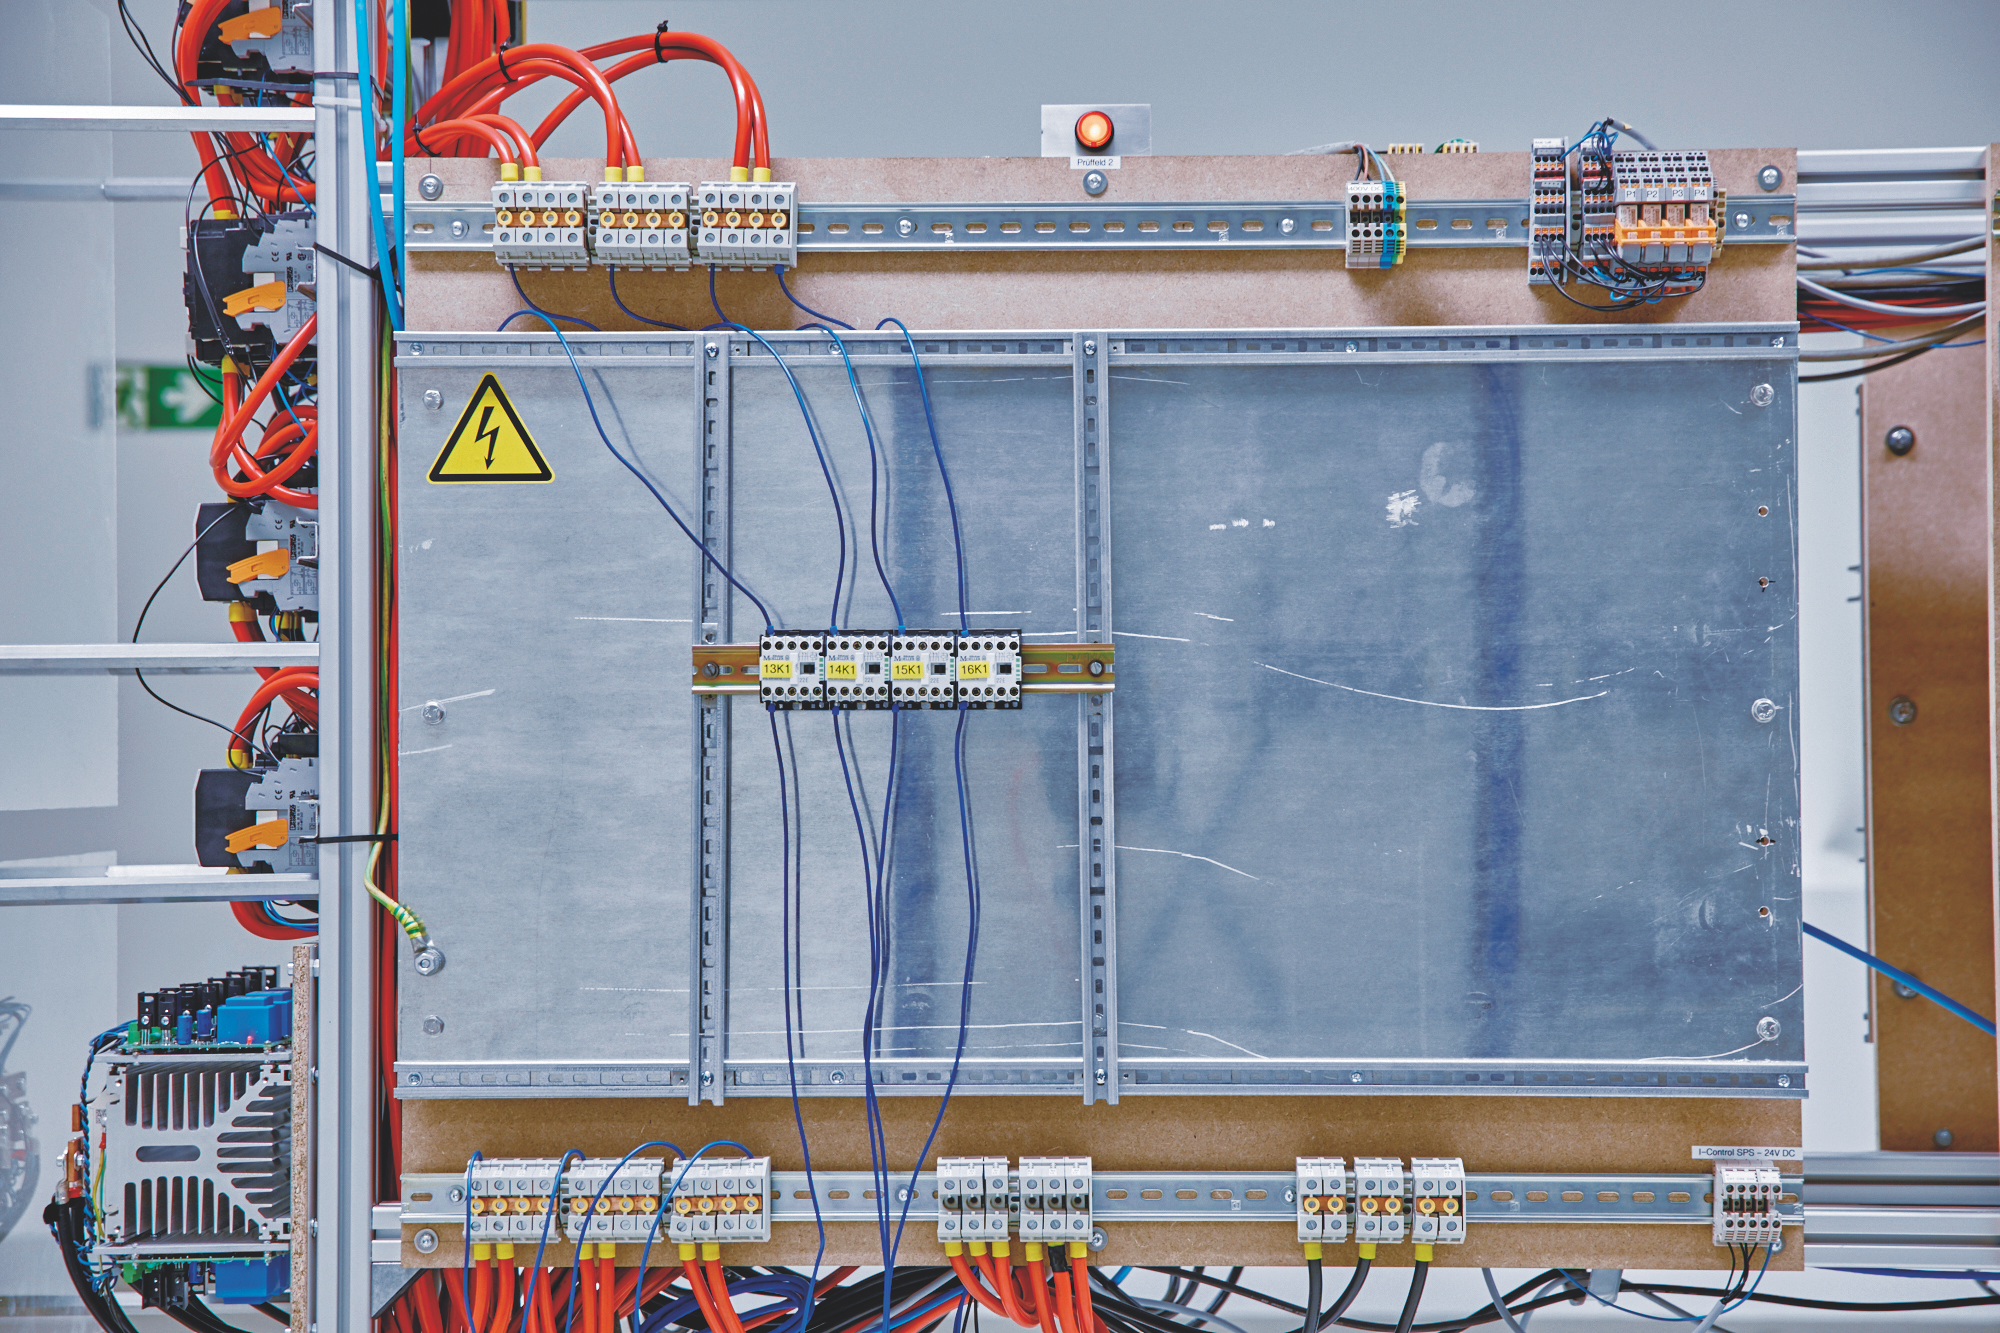 Railway Electrical Testing